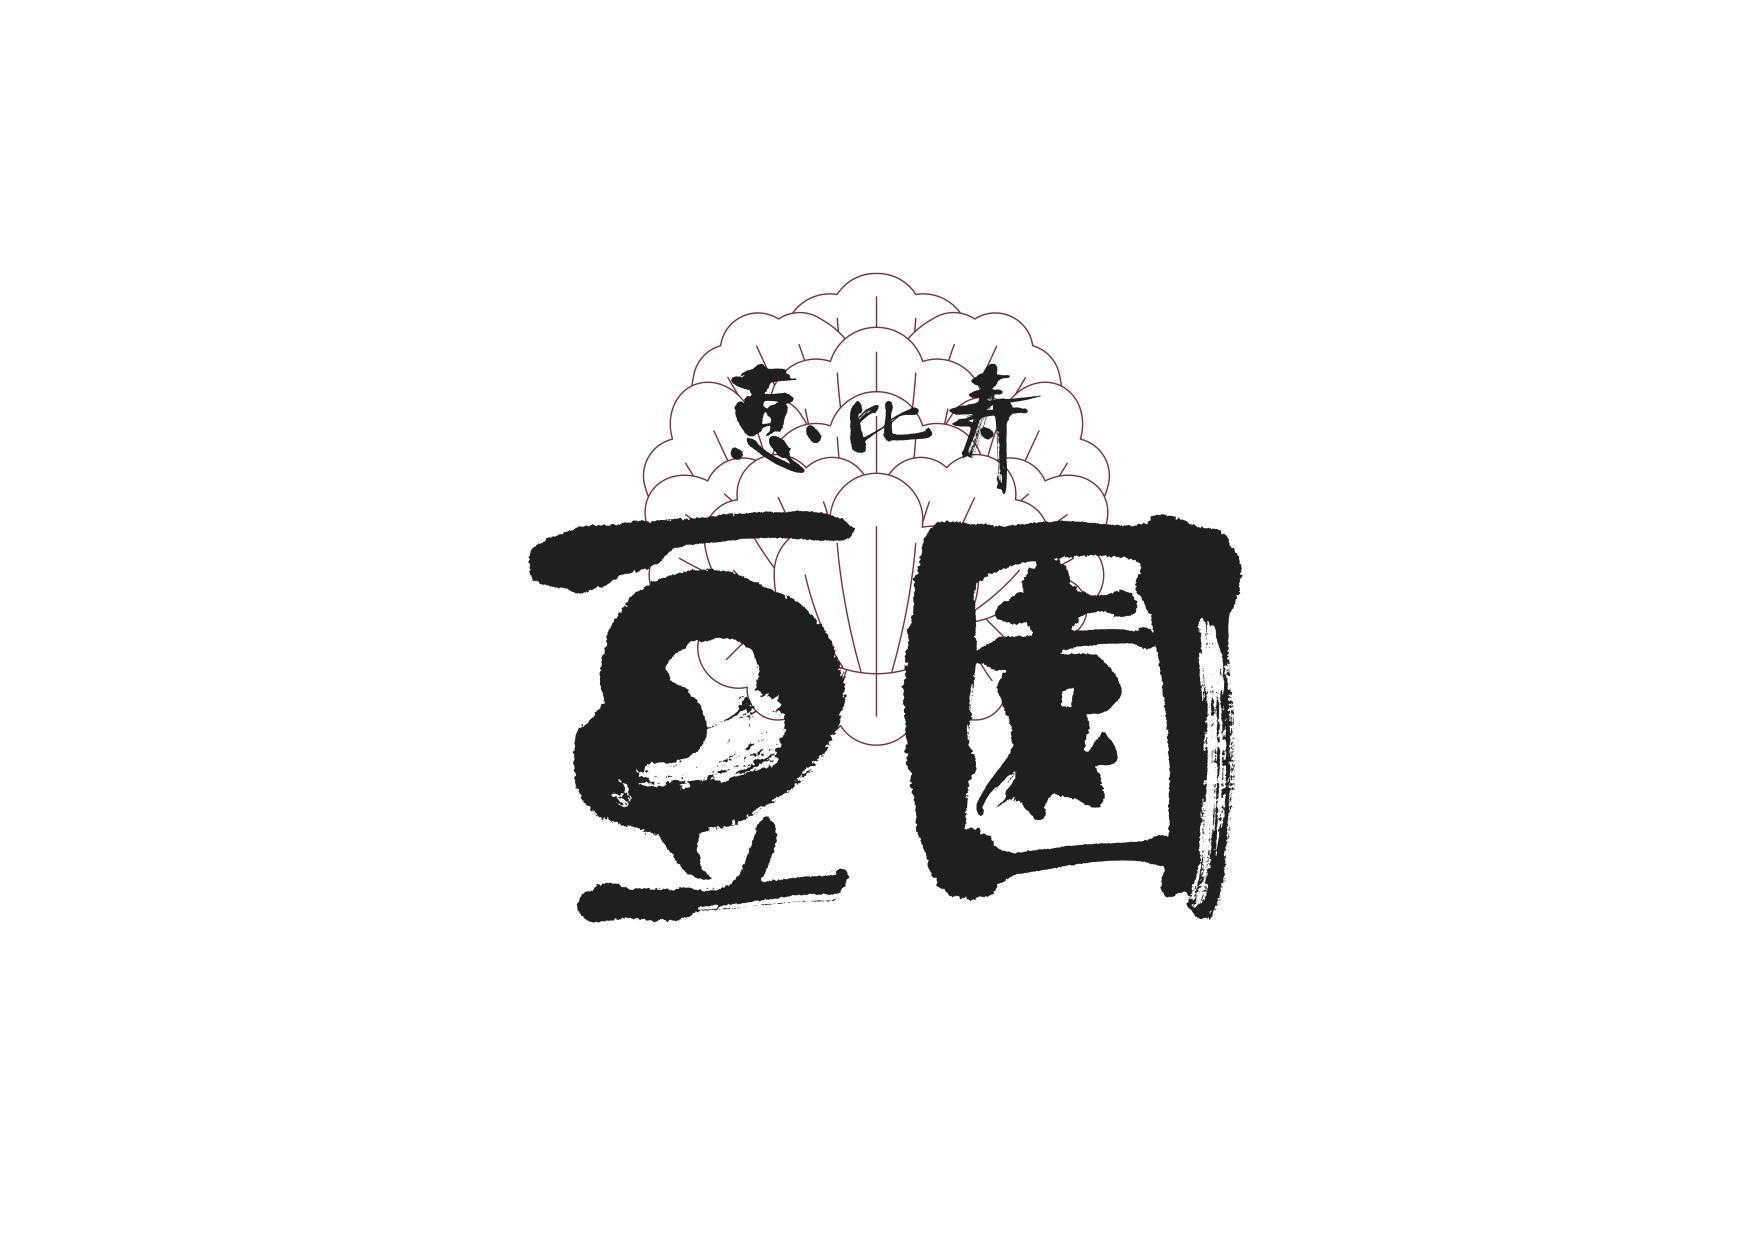 恵 比 寿 豆 園    -  e b i s u m a m e z o n o-